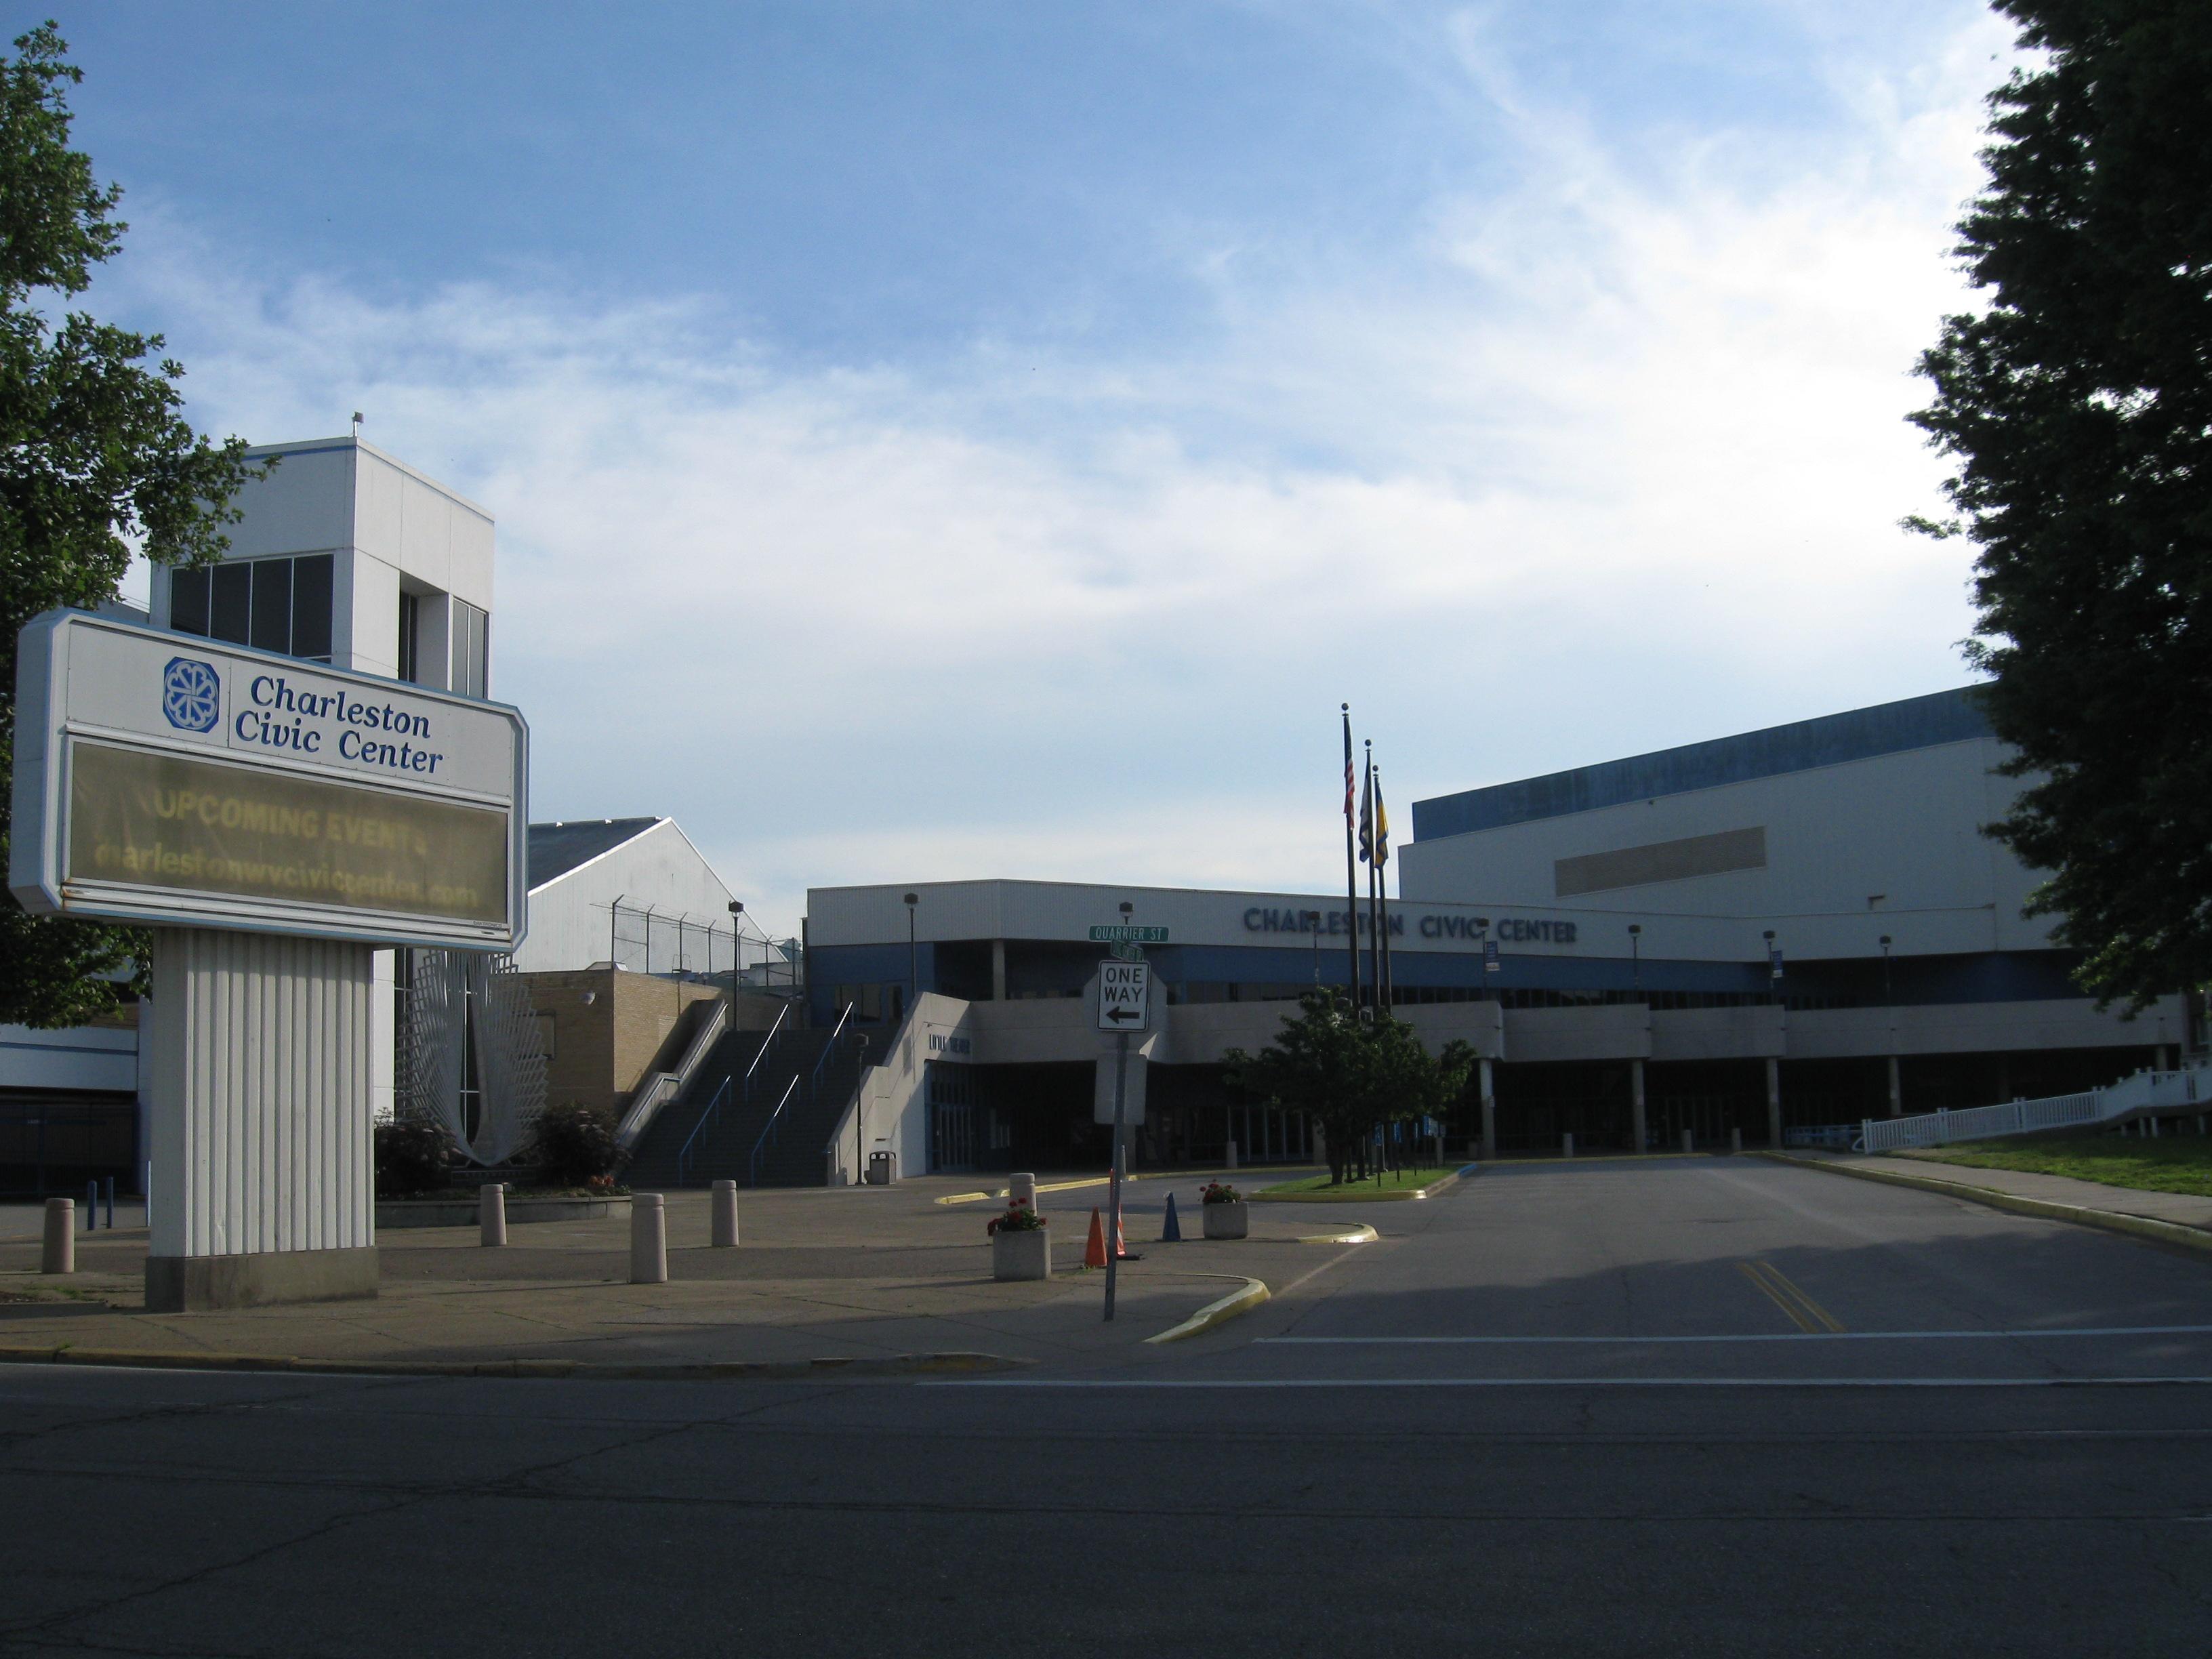 Home Insurance Beckley Wv Charleston Civic Center